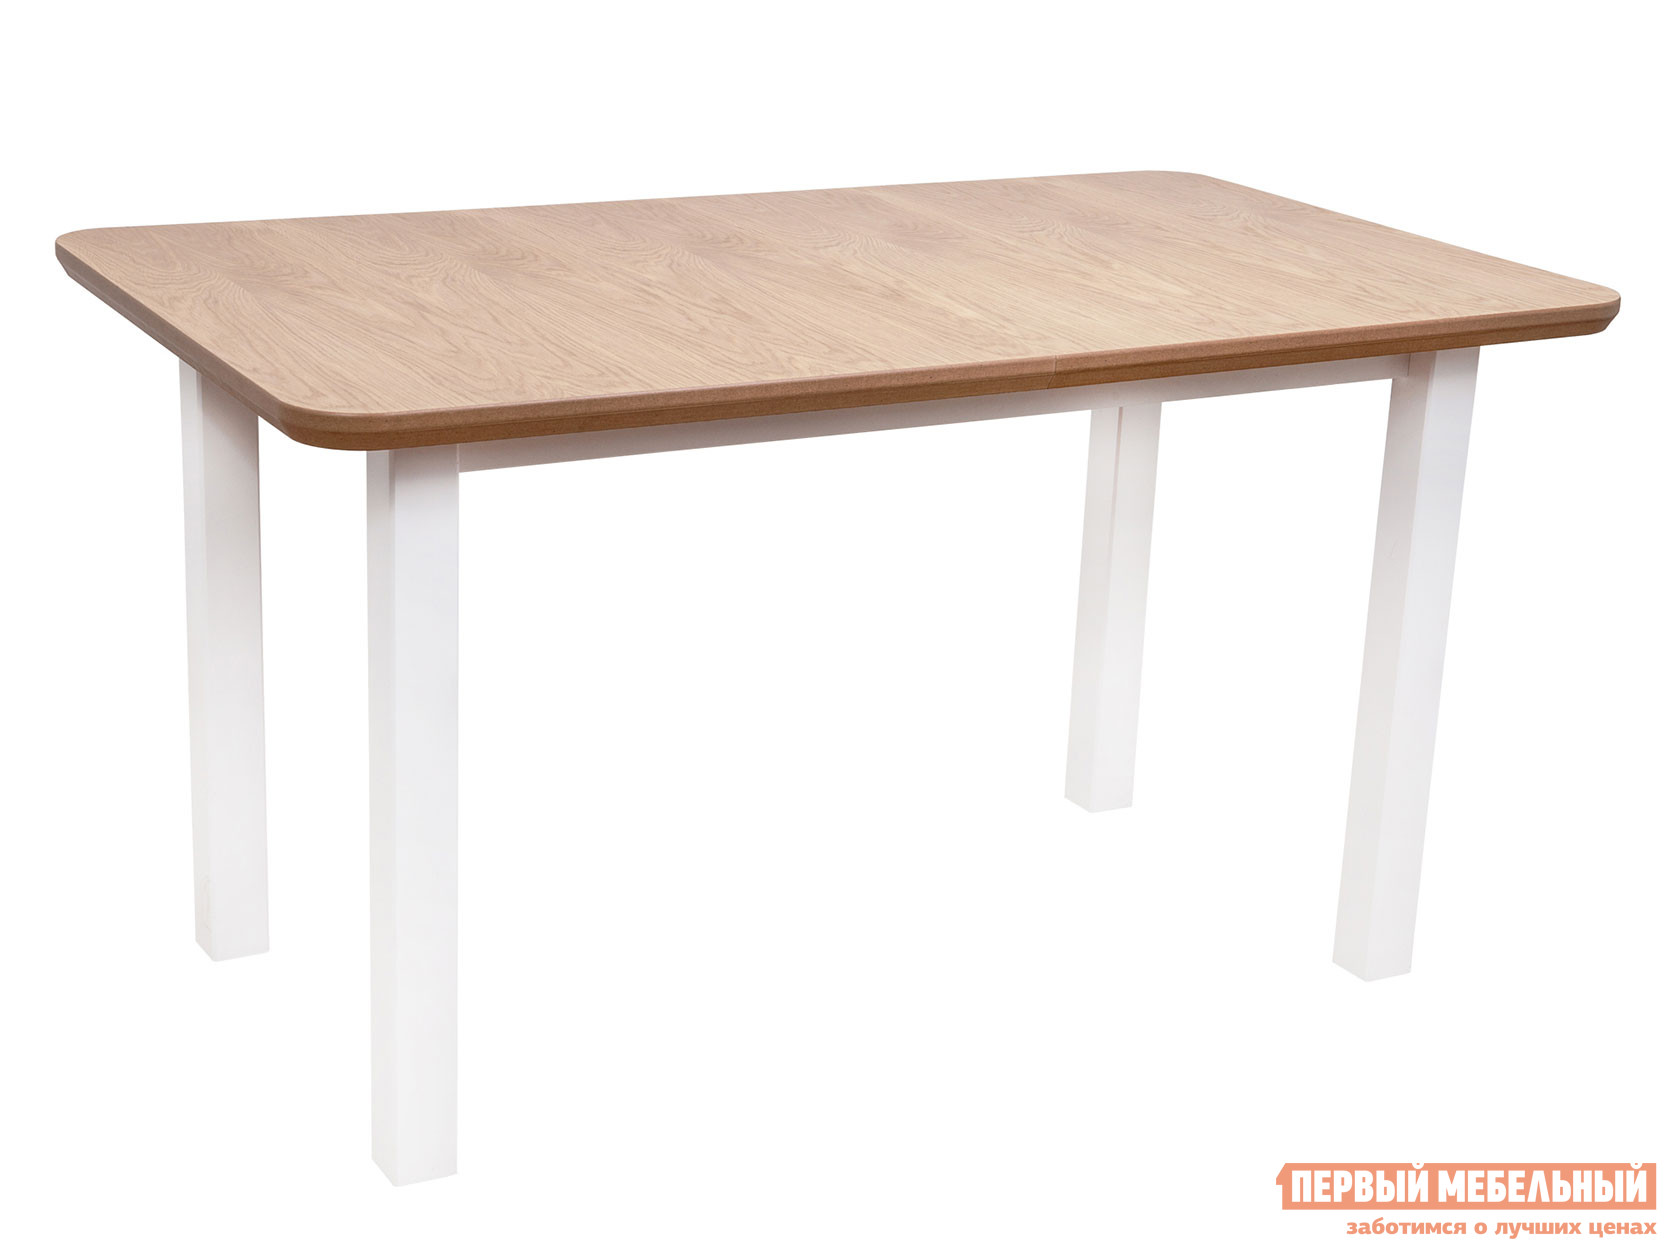 Кухонный стол  Стол WENUS 2 S, 140(180)*80*76 Дуб натуральный / Белый